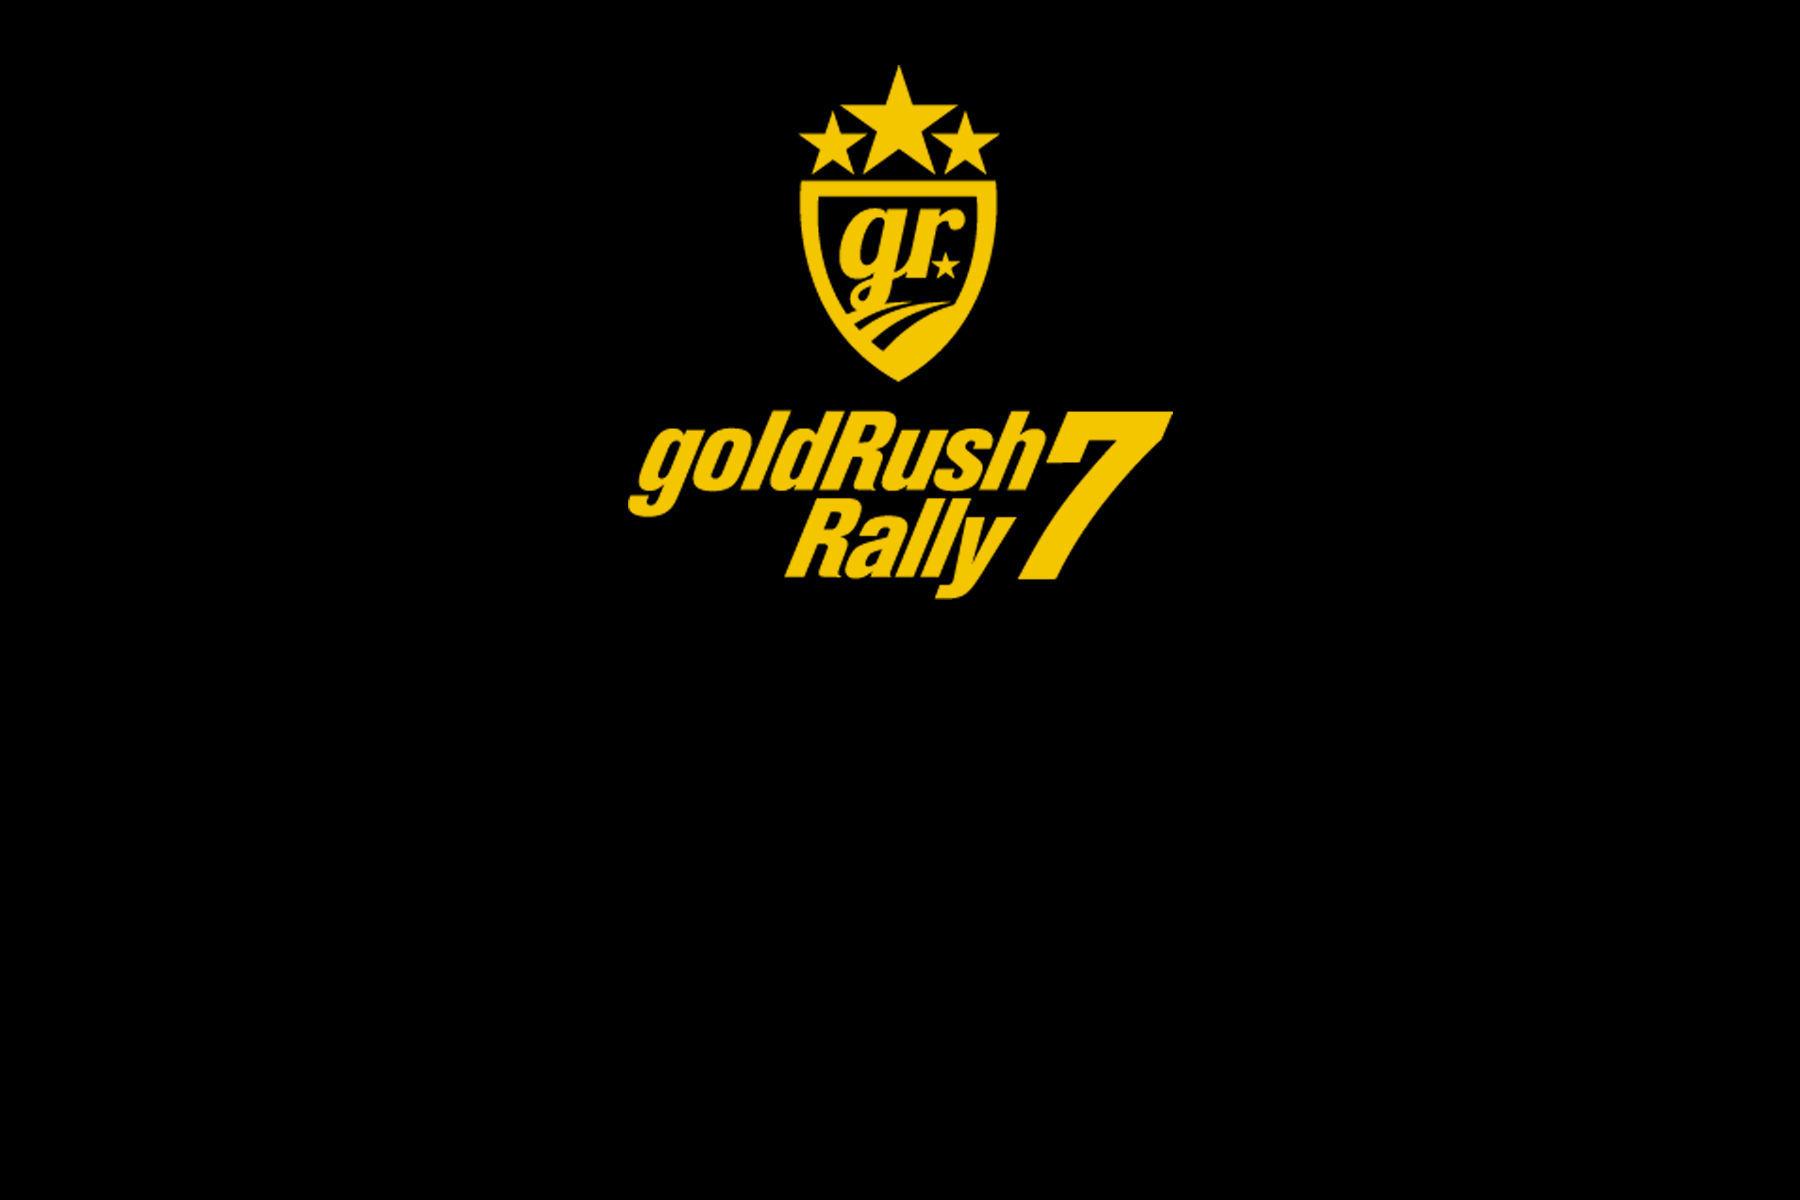 | goldRush Rally 7